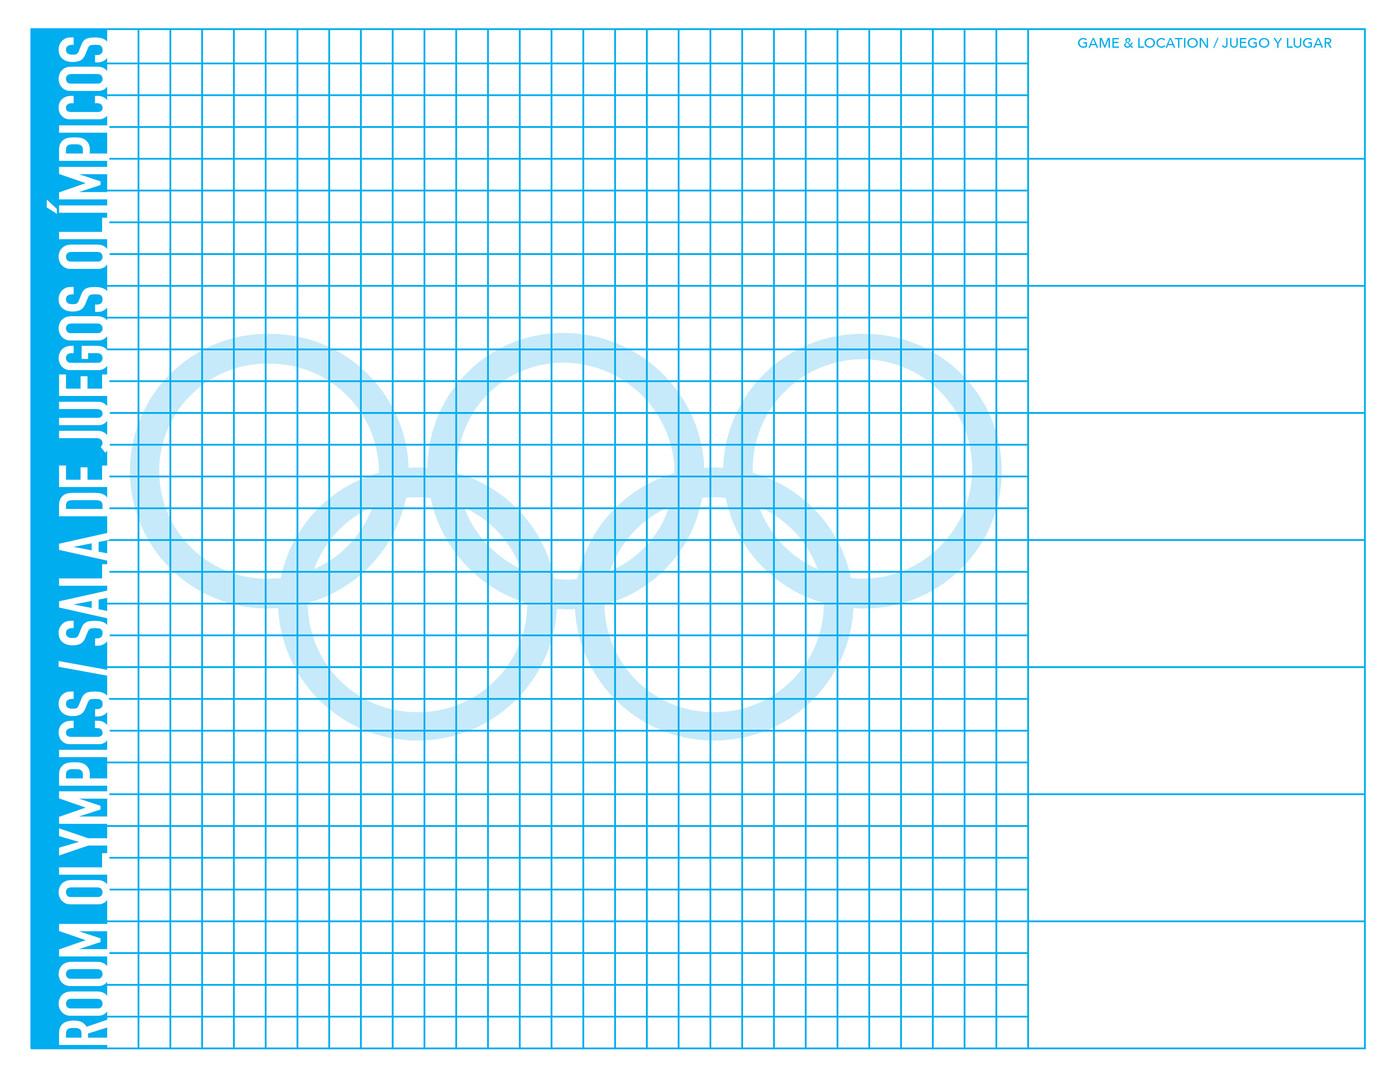 Room olympics_1X.jpg